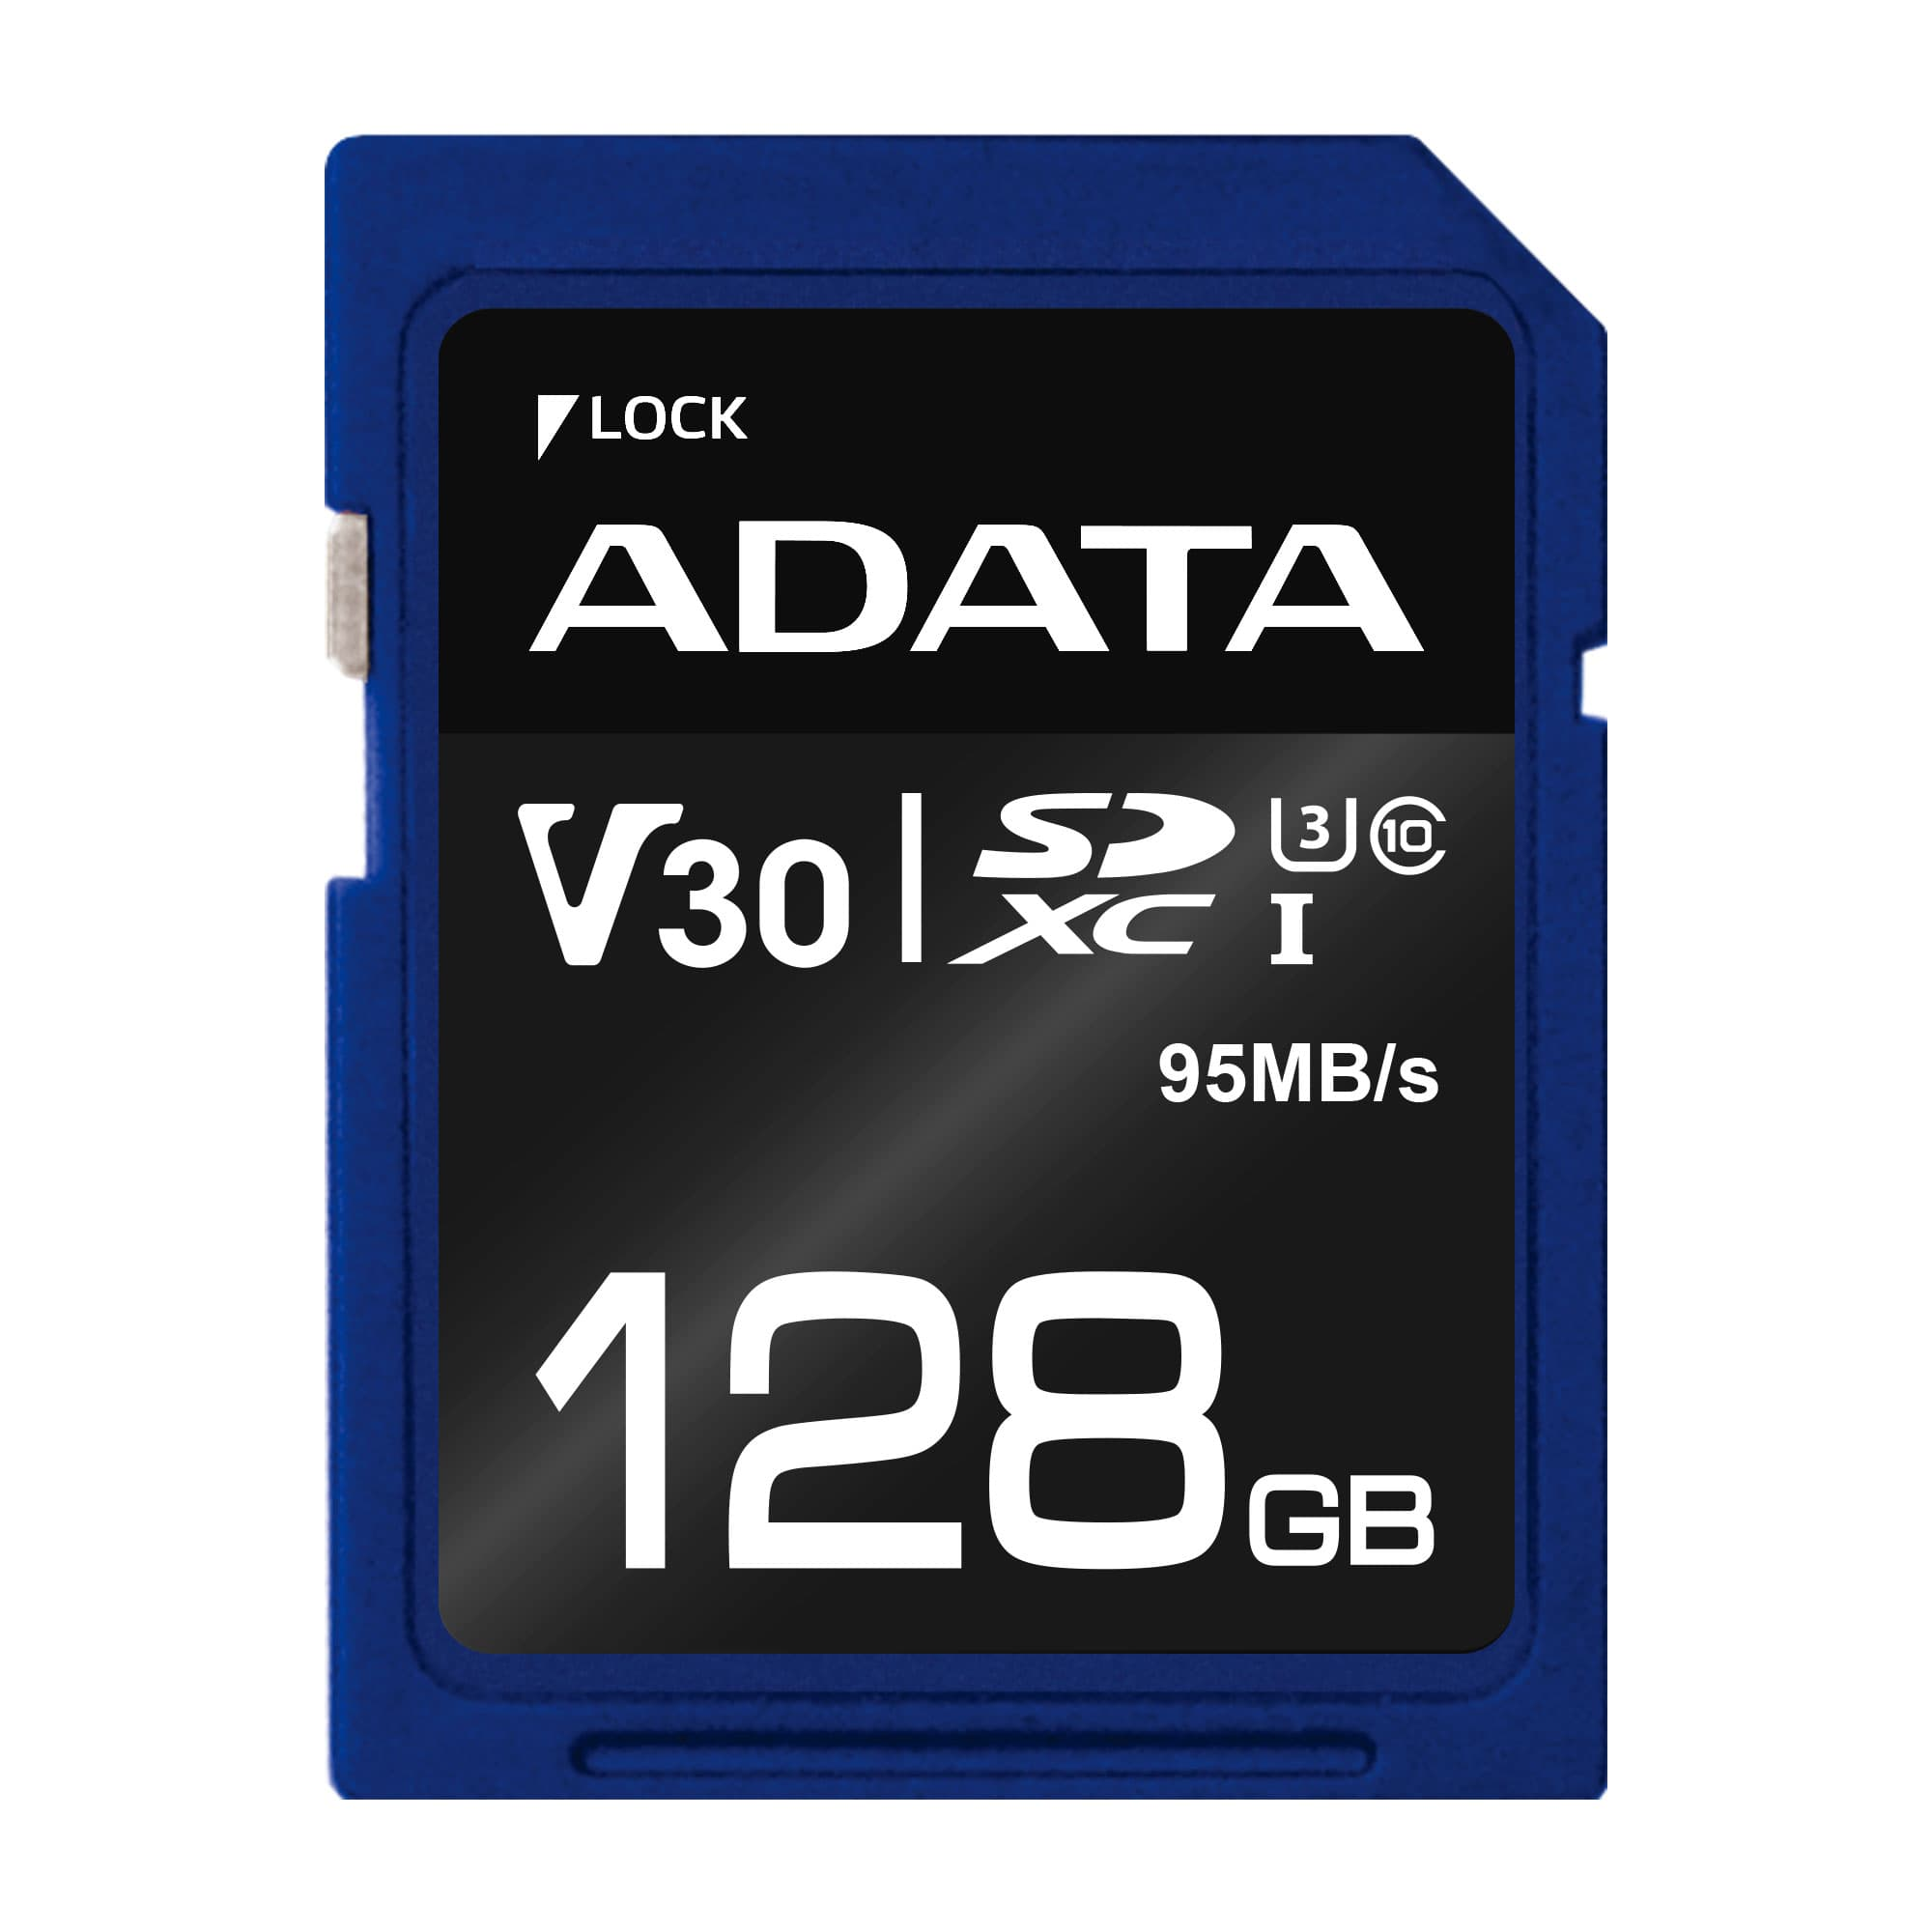 ADATA SDXC 128GB UHS-I U3 V30S 95/60MB/s - ASDX128GUI3V30S-R